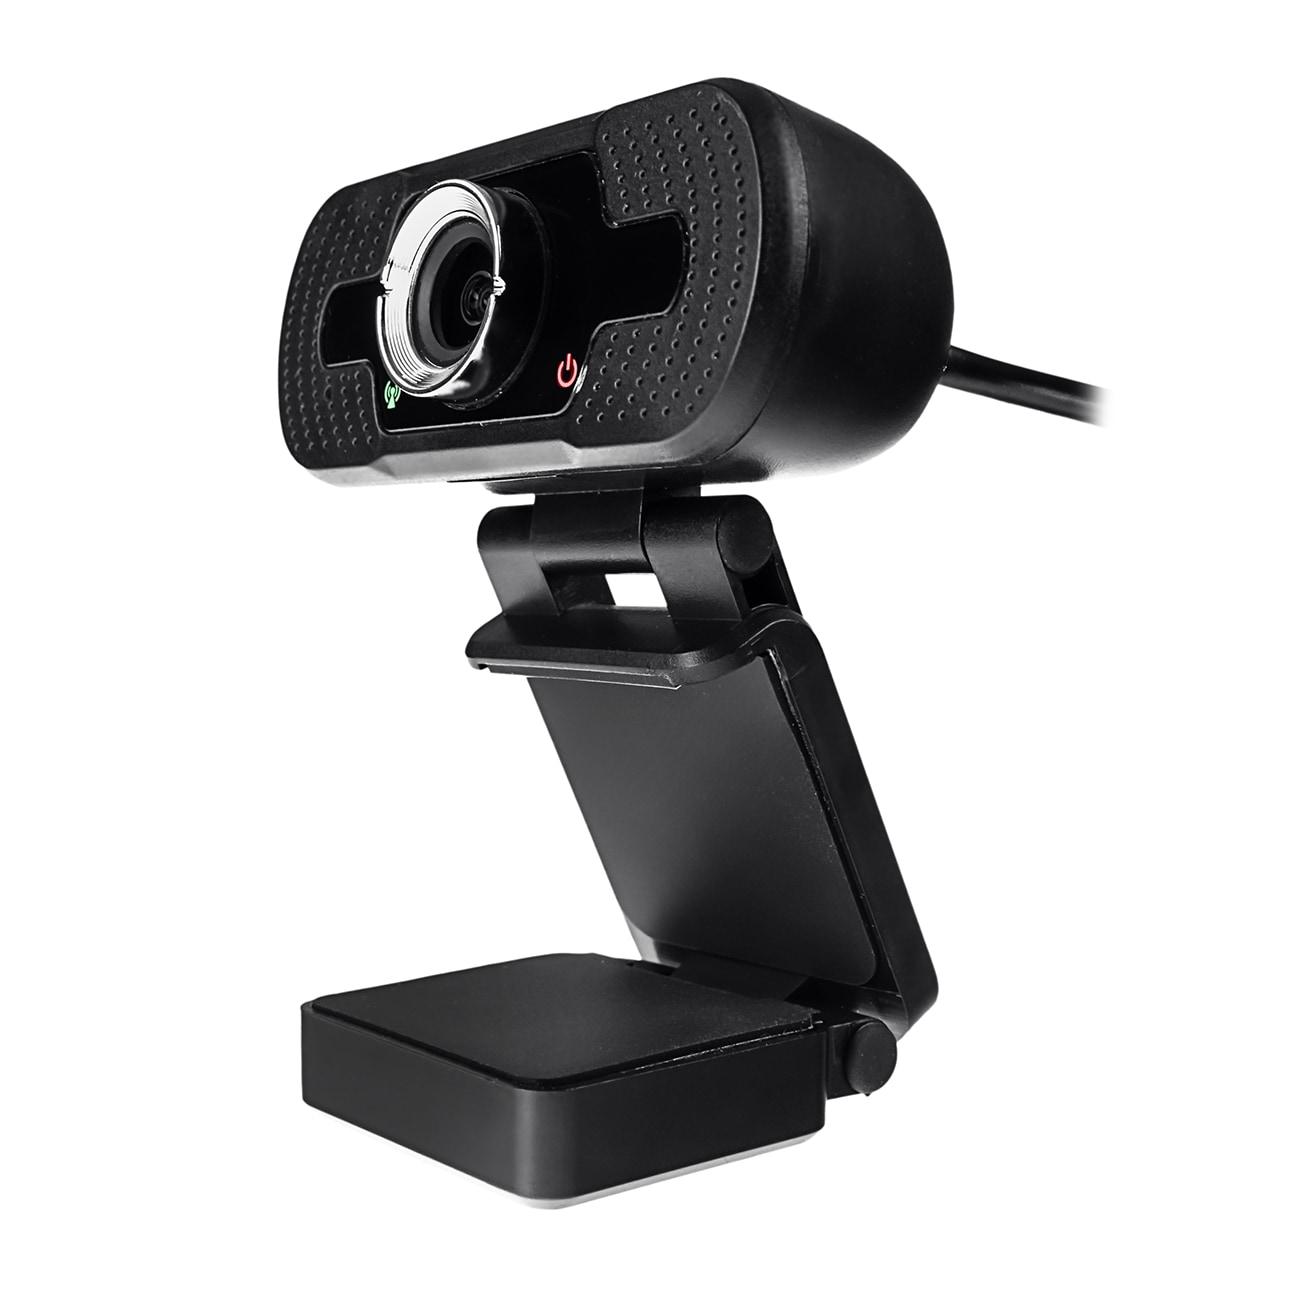 Webcam for Streaming Microphone Camera USB FHD SP-WCAM01 - 1